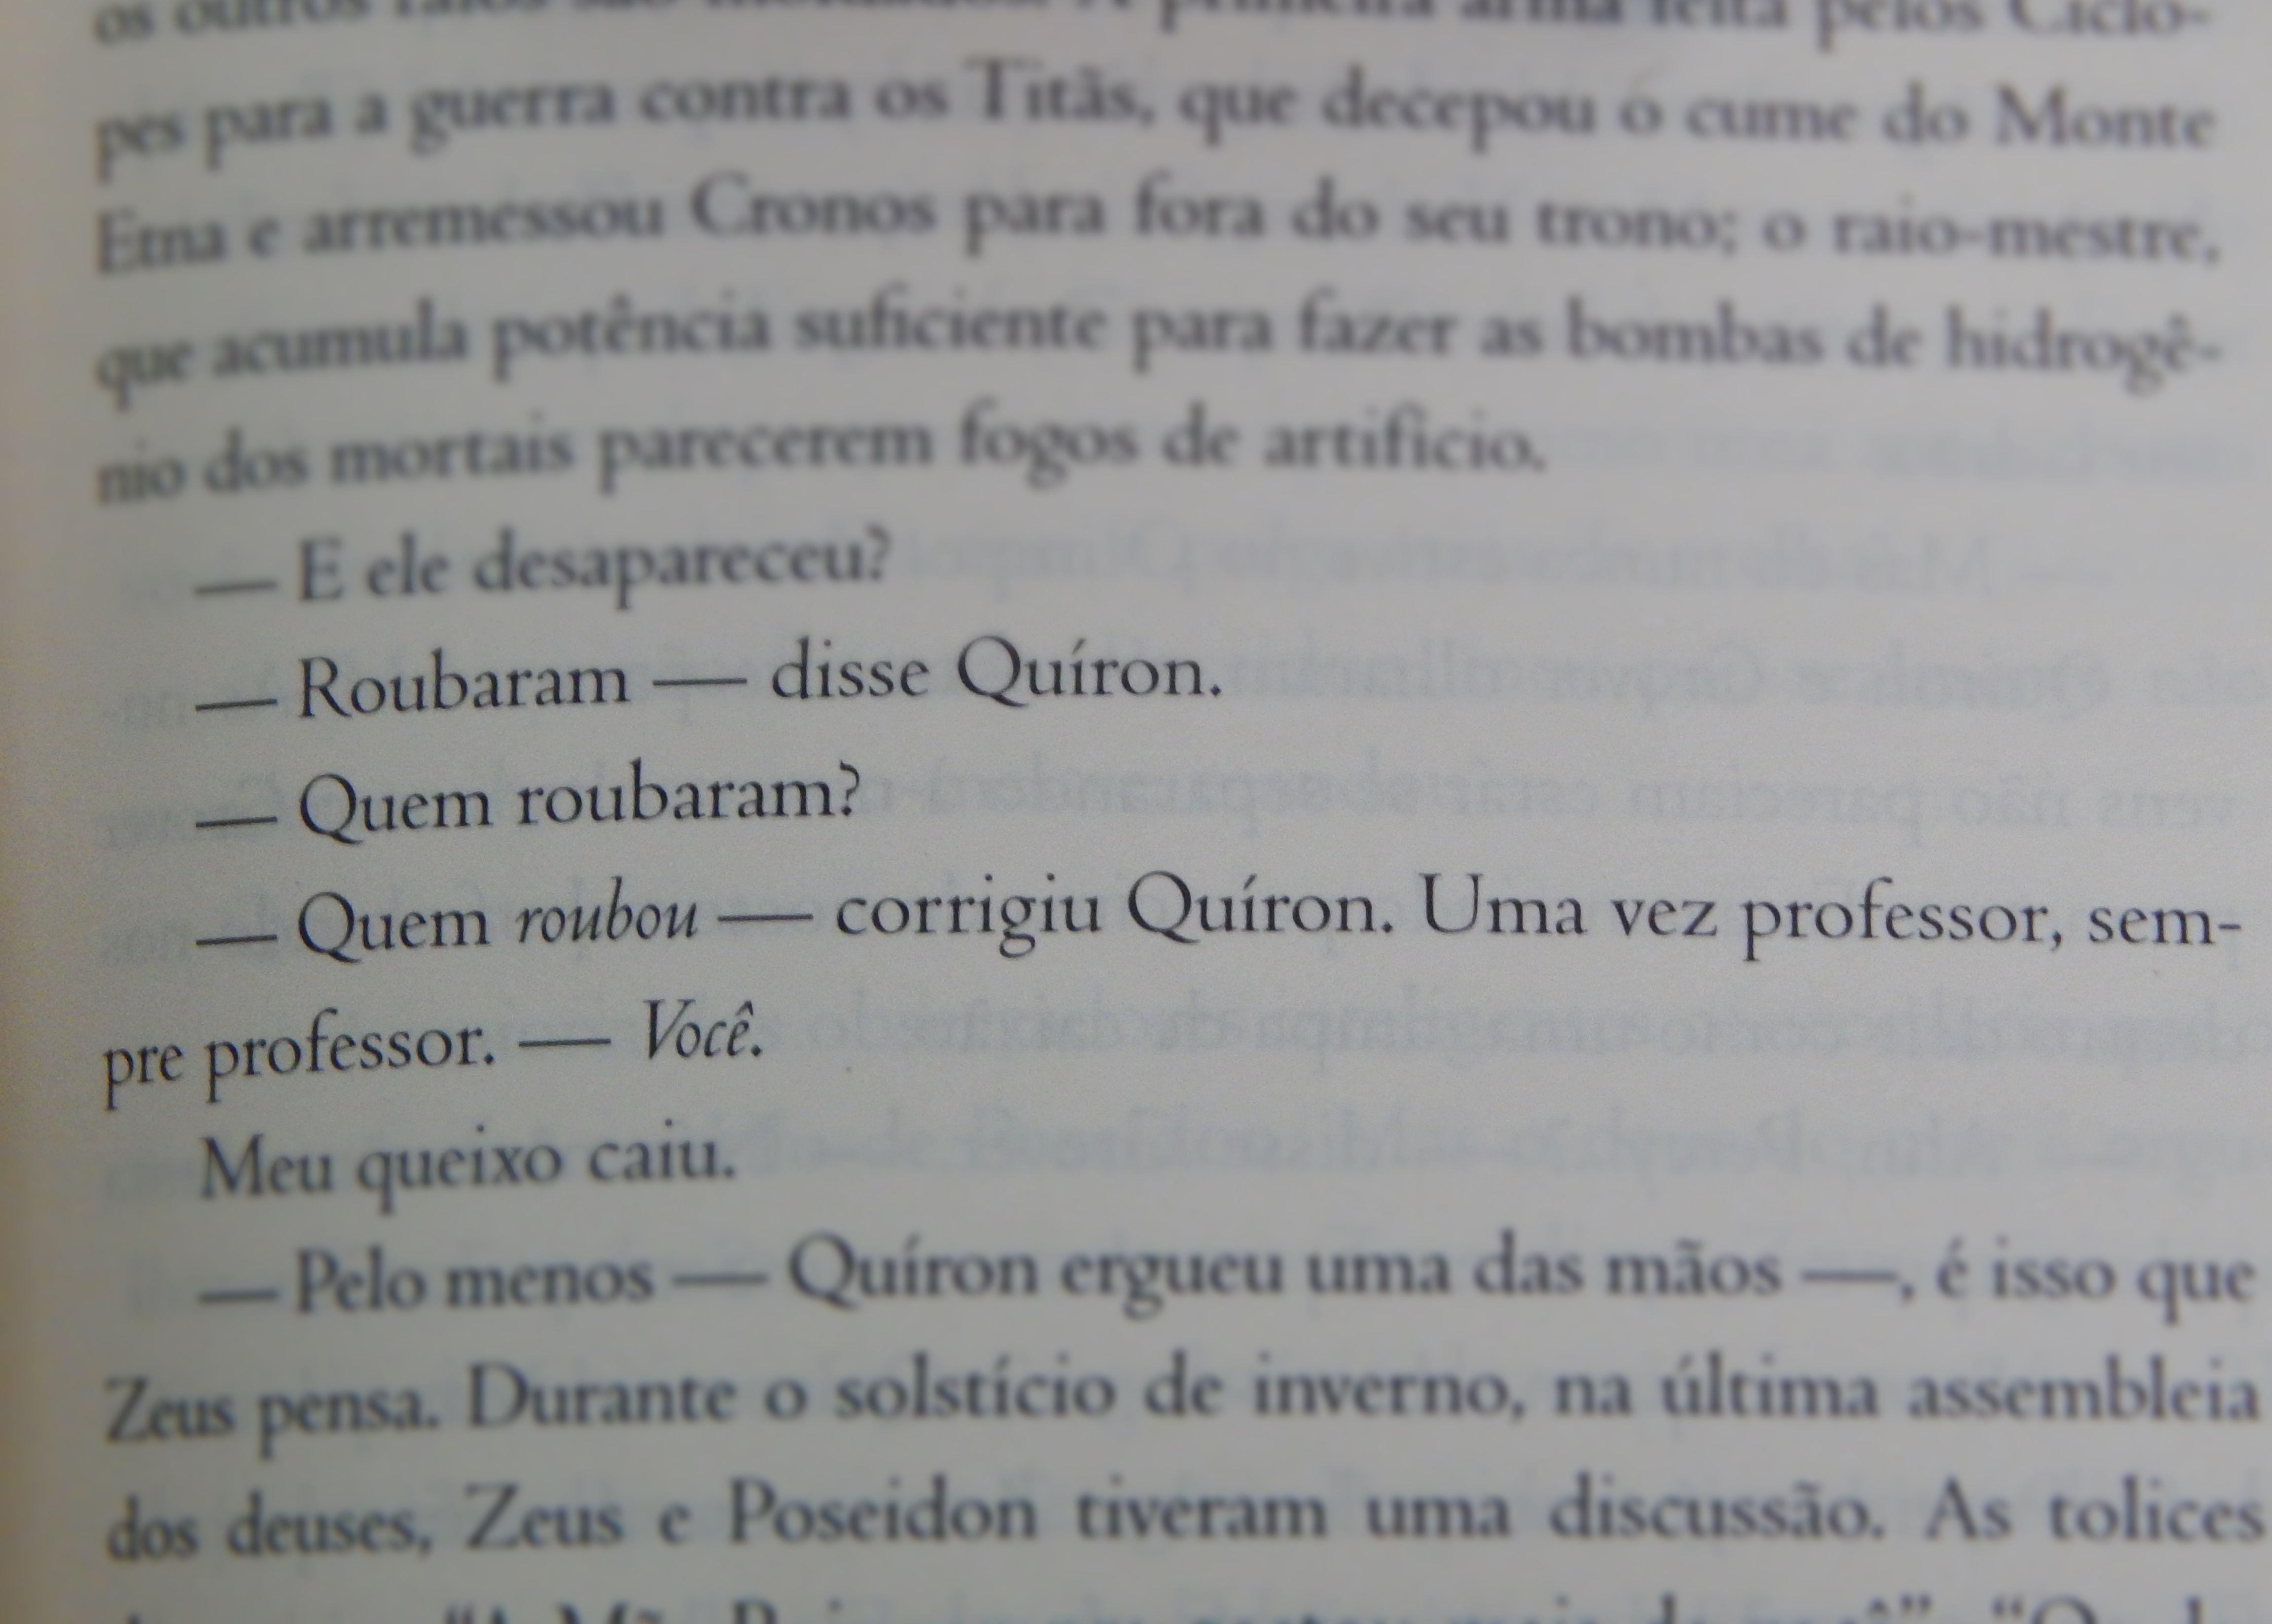 #PercyJackson #Quíron #LadrãoDeRaios